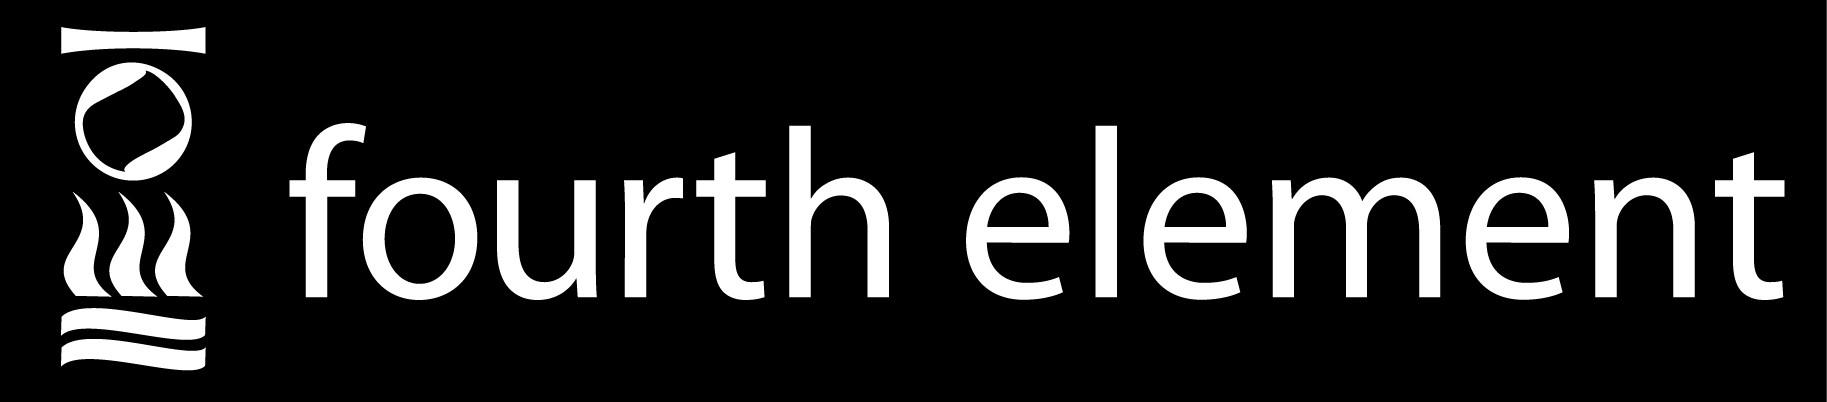 FOURTH ELEMENTS